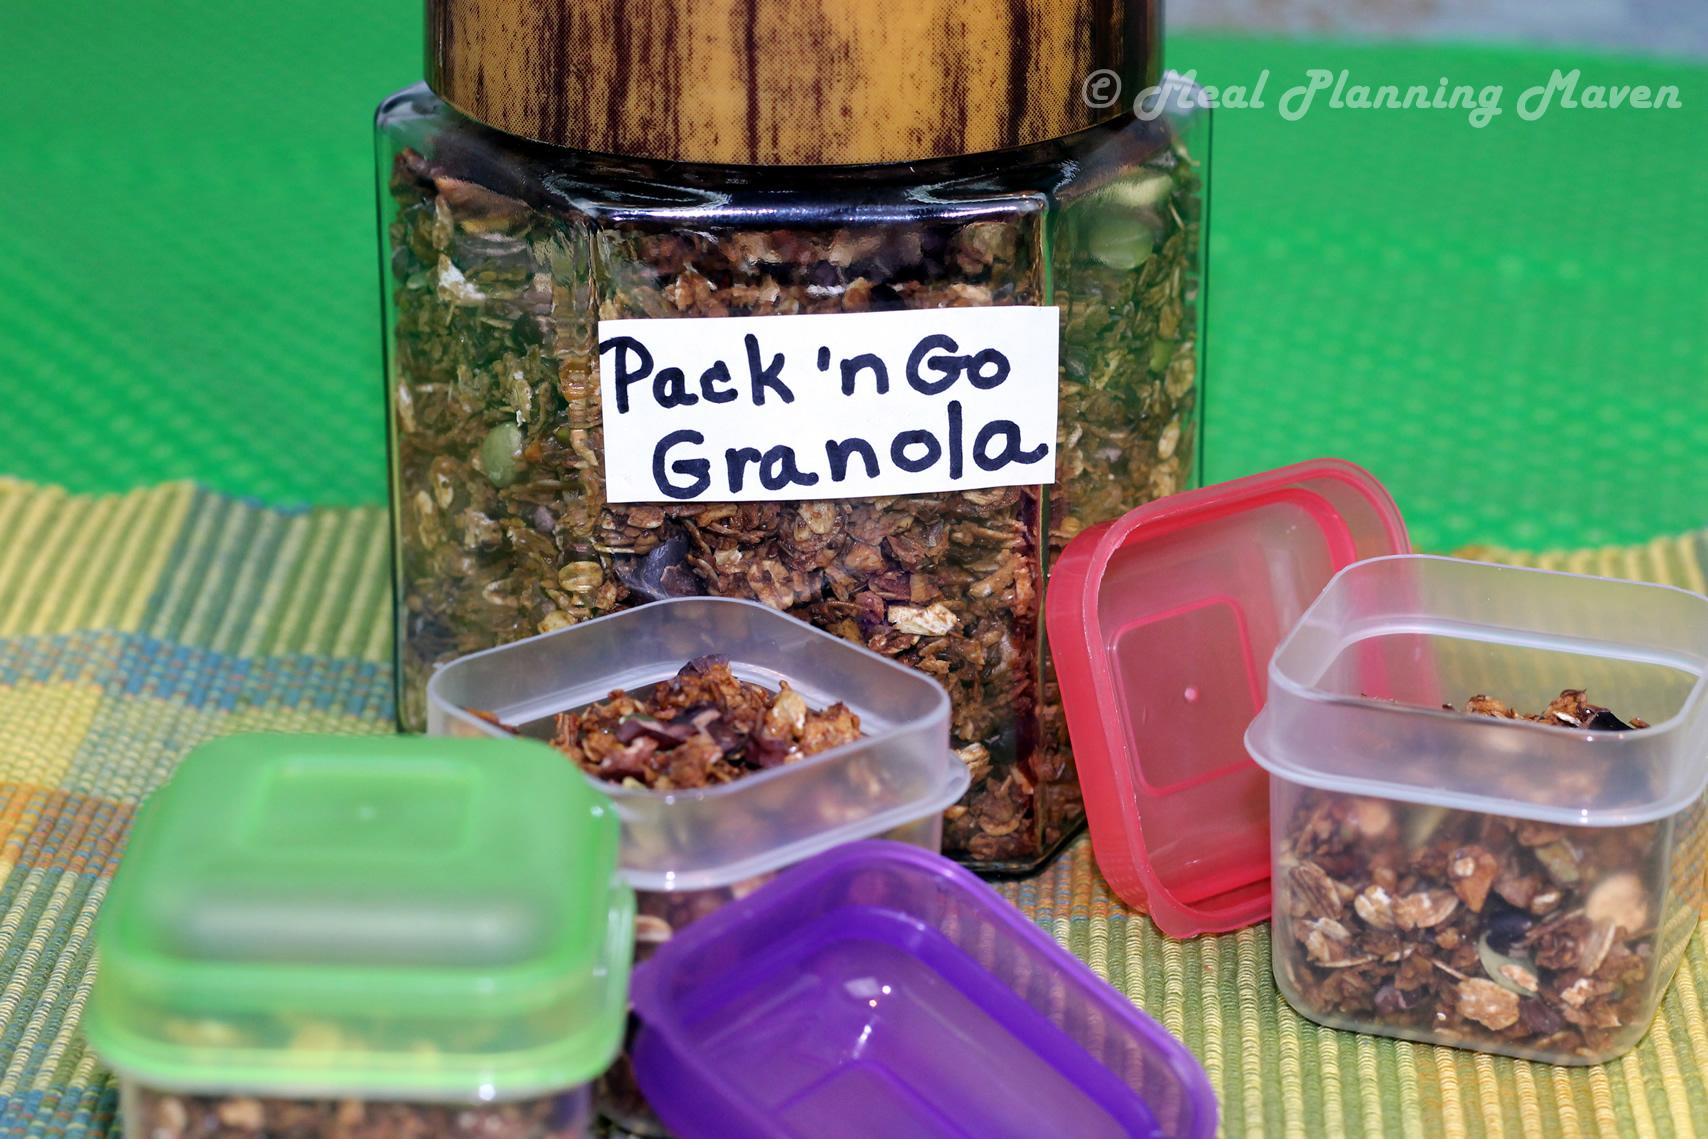 Pack 'n Go Granola